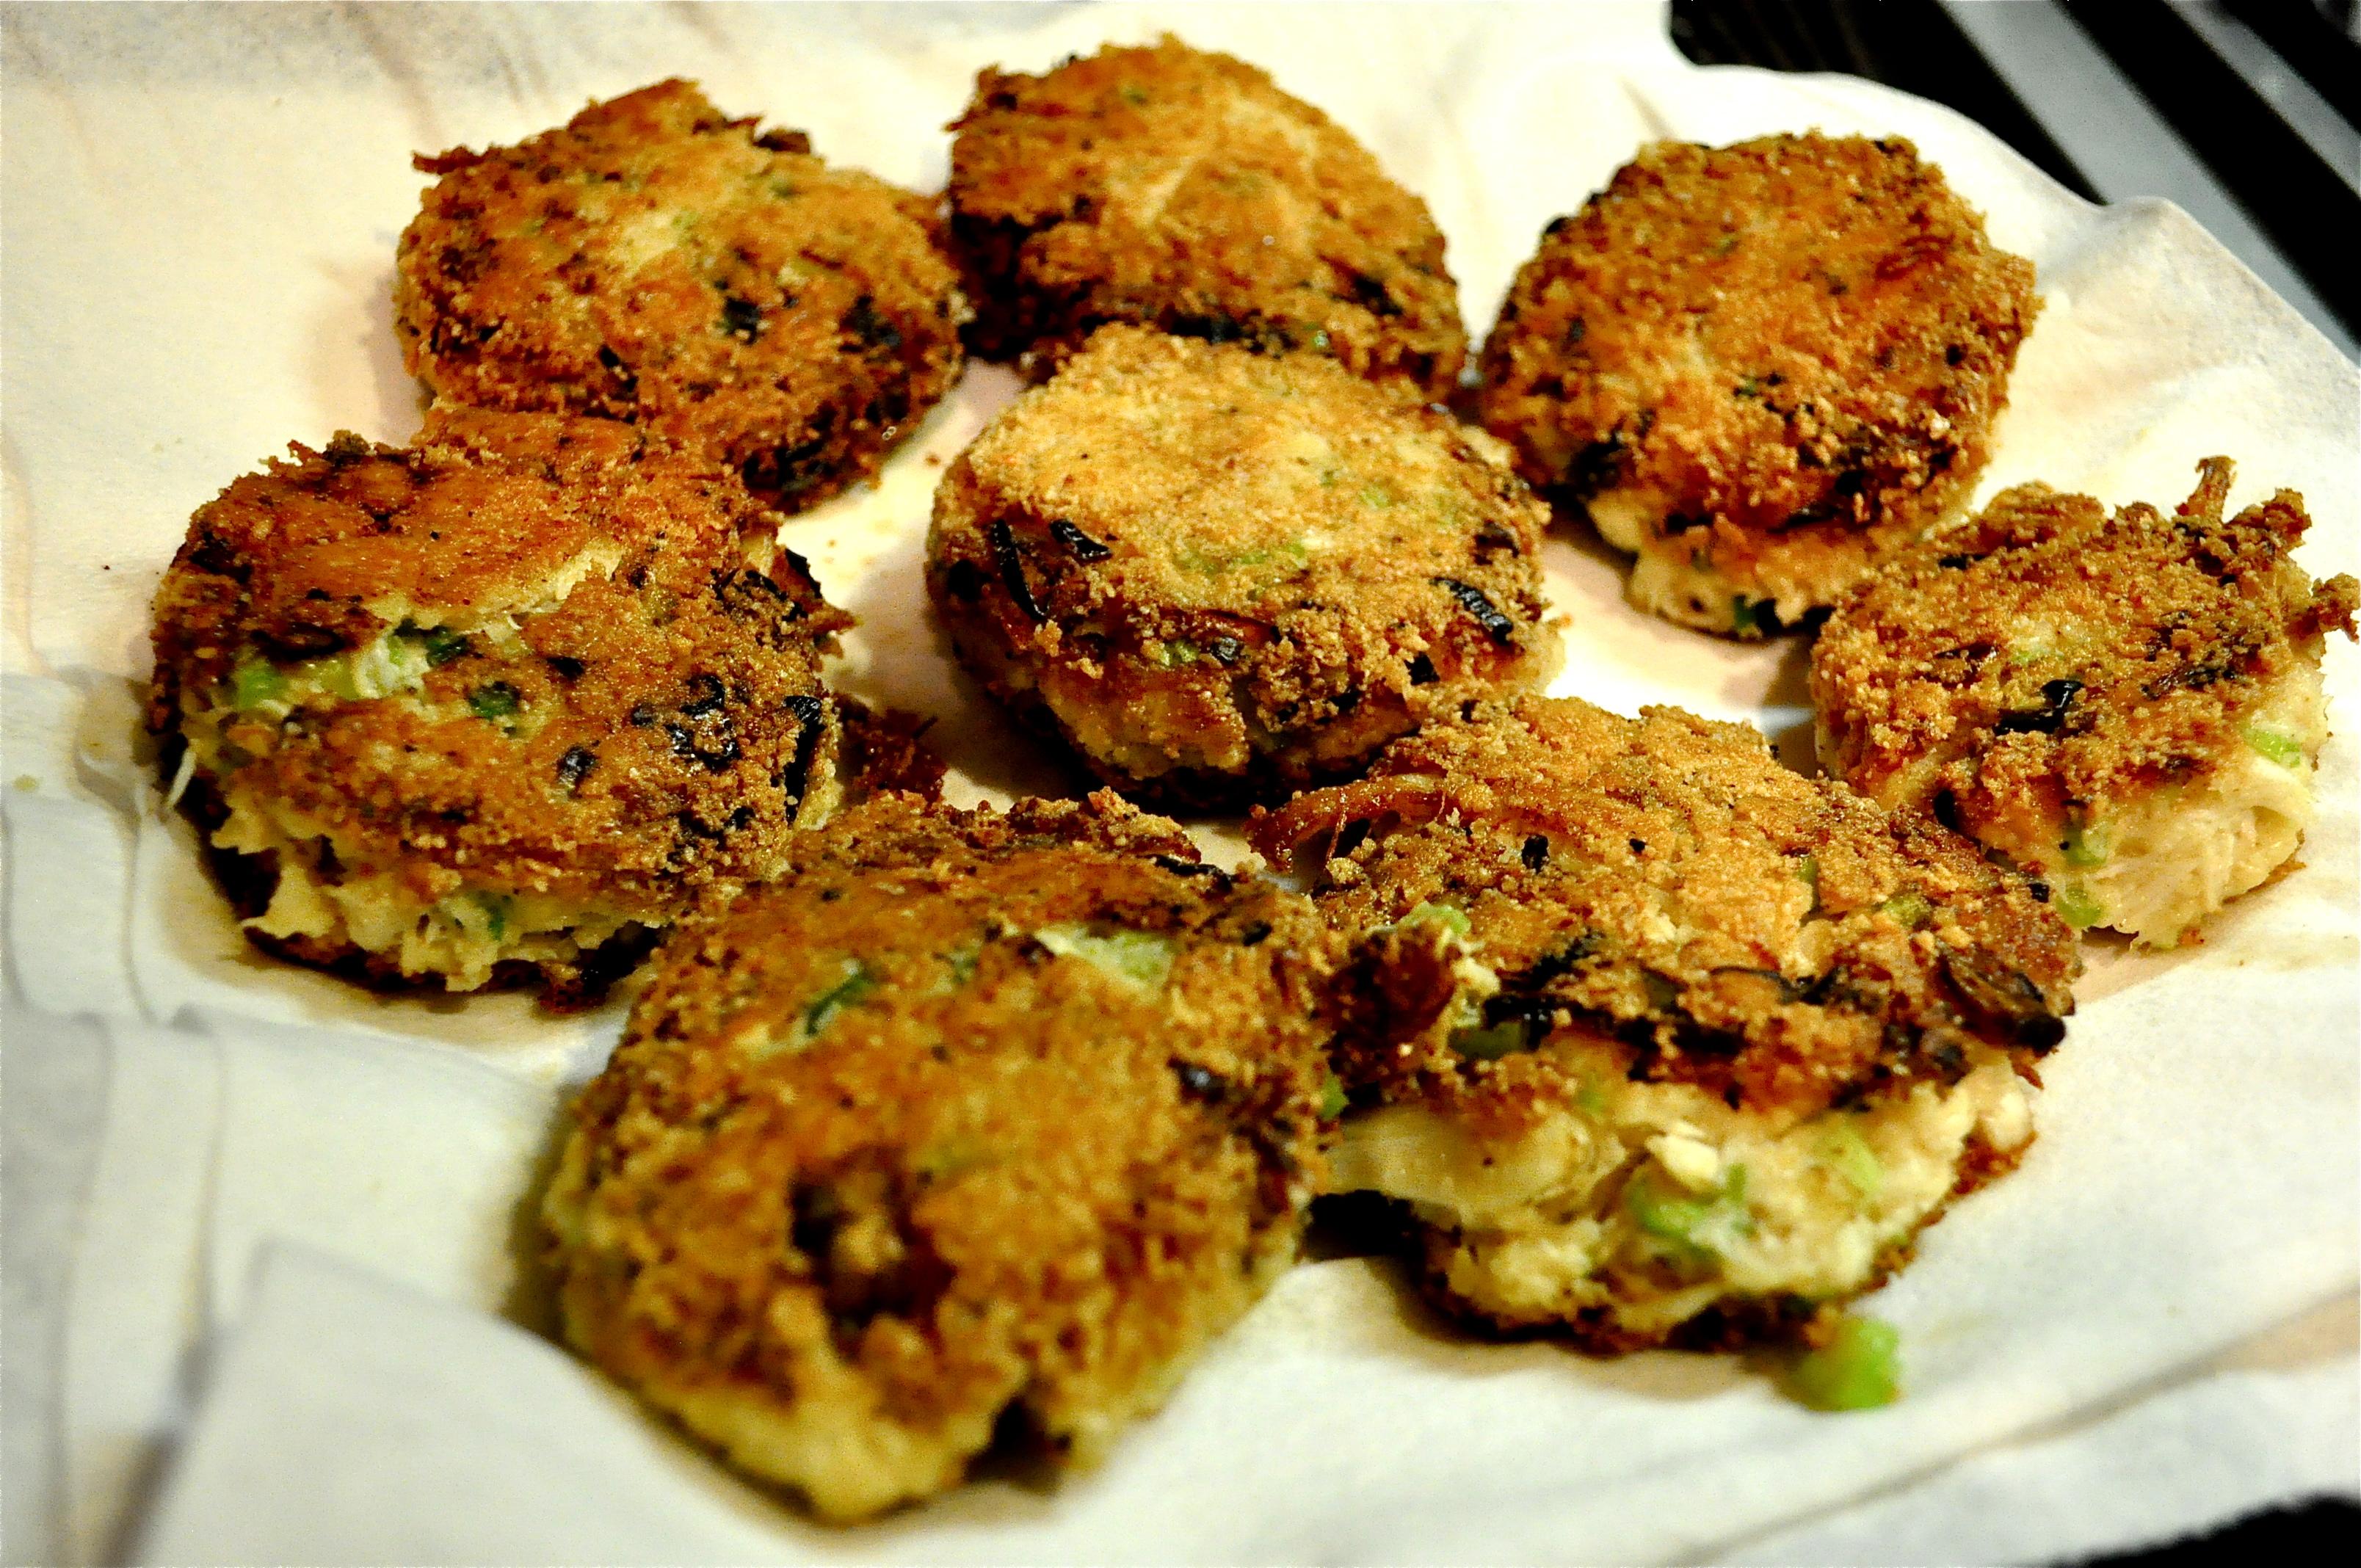 Fed & FitPaleo Crab Cakes with Lemon Garlic Aioli - Fed & Fit